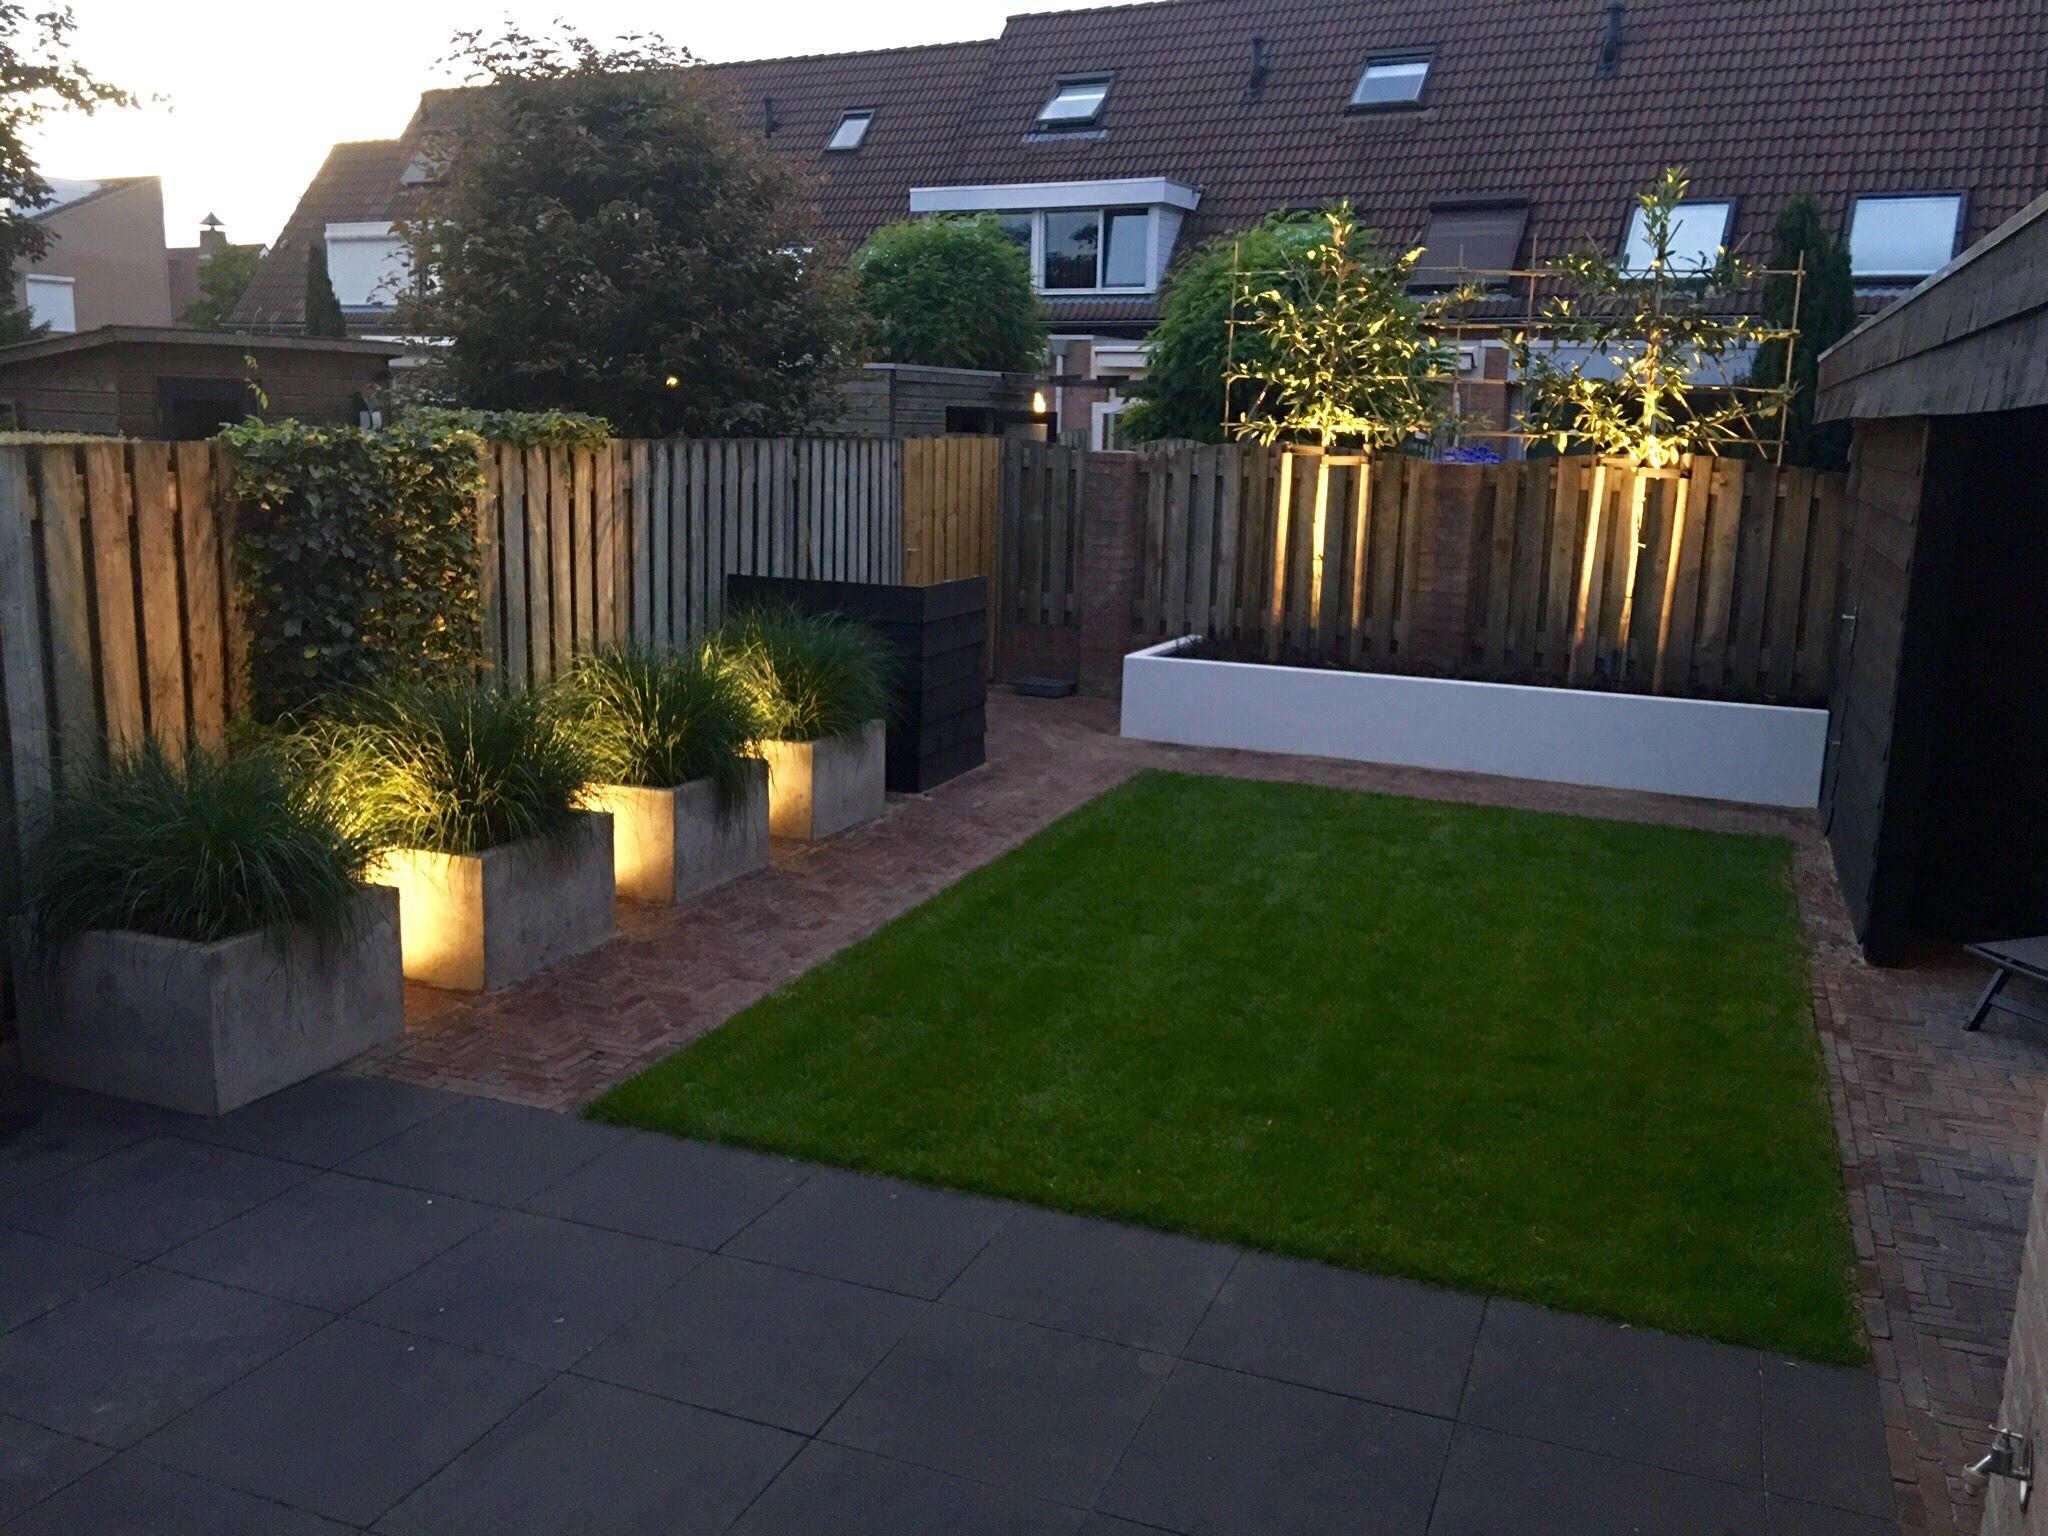 strakke tuin met betonnen bakken en witte border garden